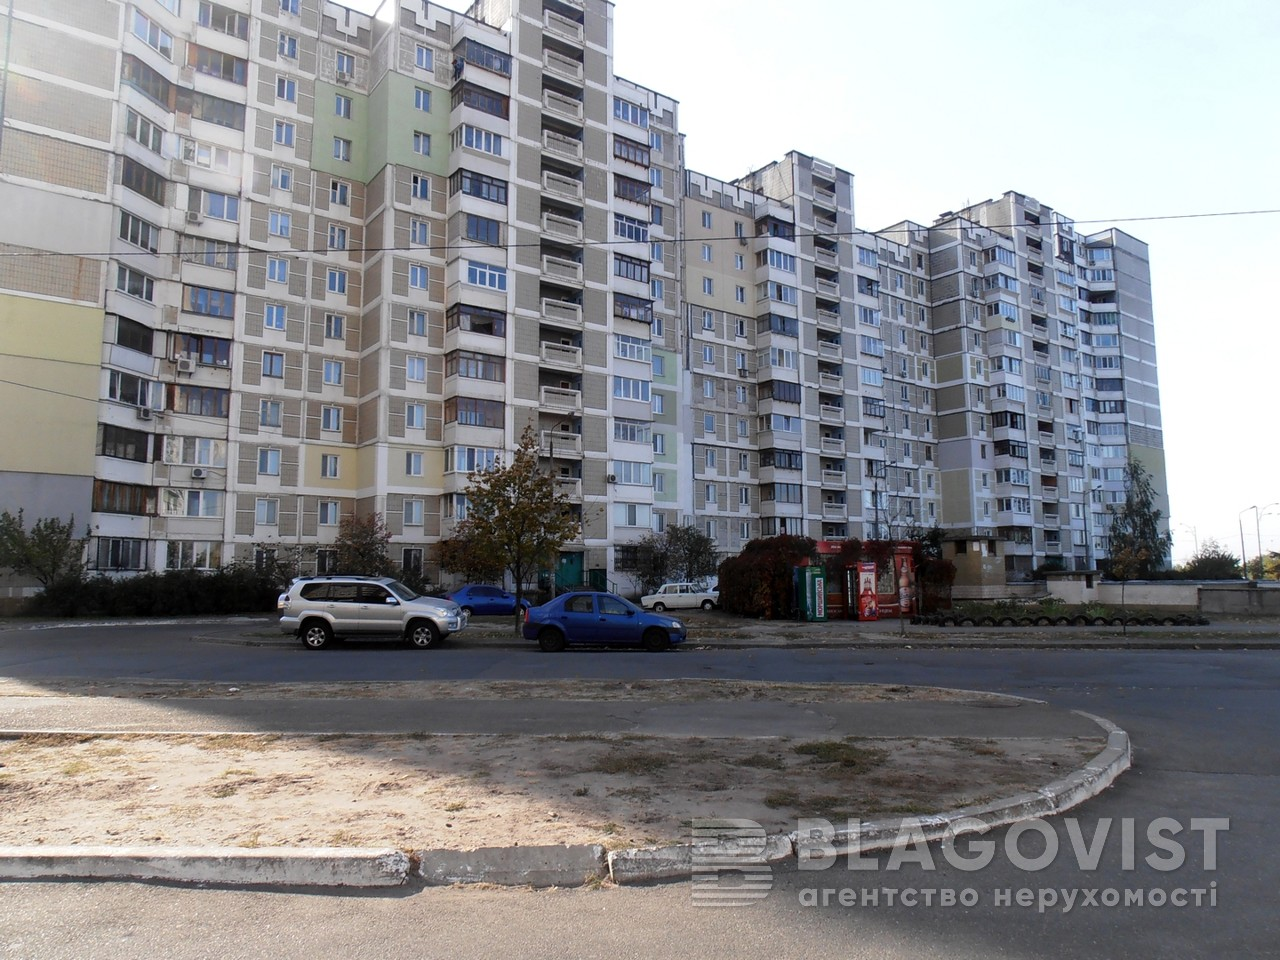 Квартира E-37343, Лаврухина, 15/46, Киев - Фото 3